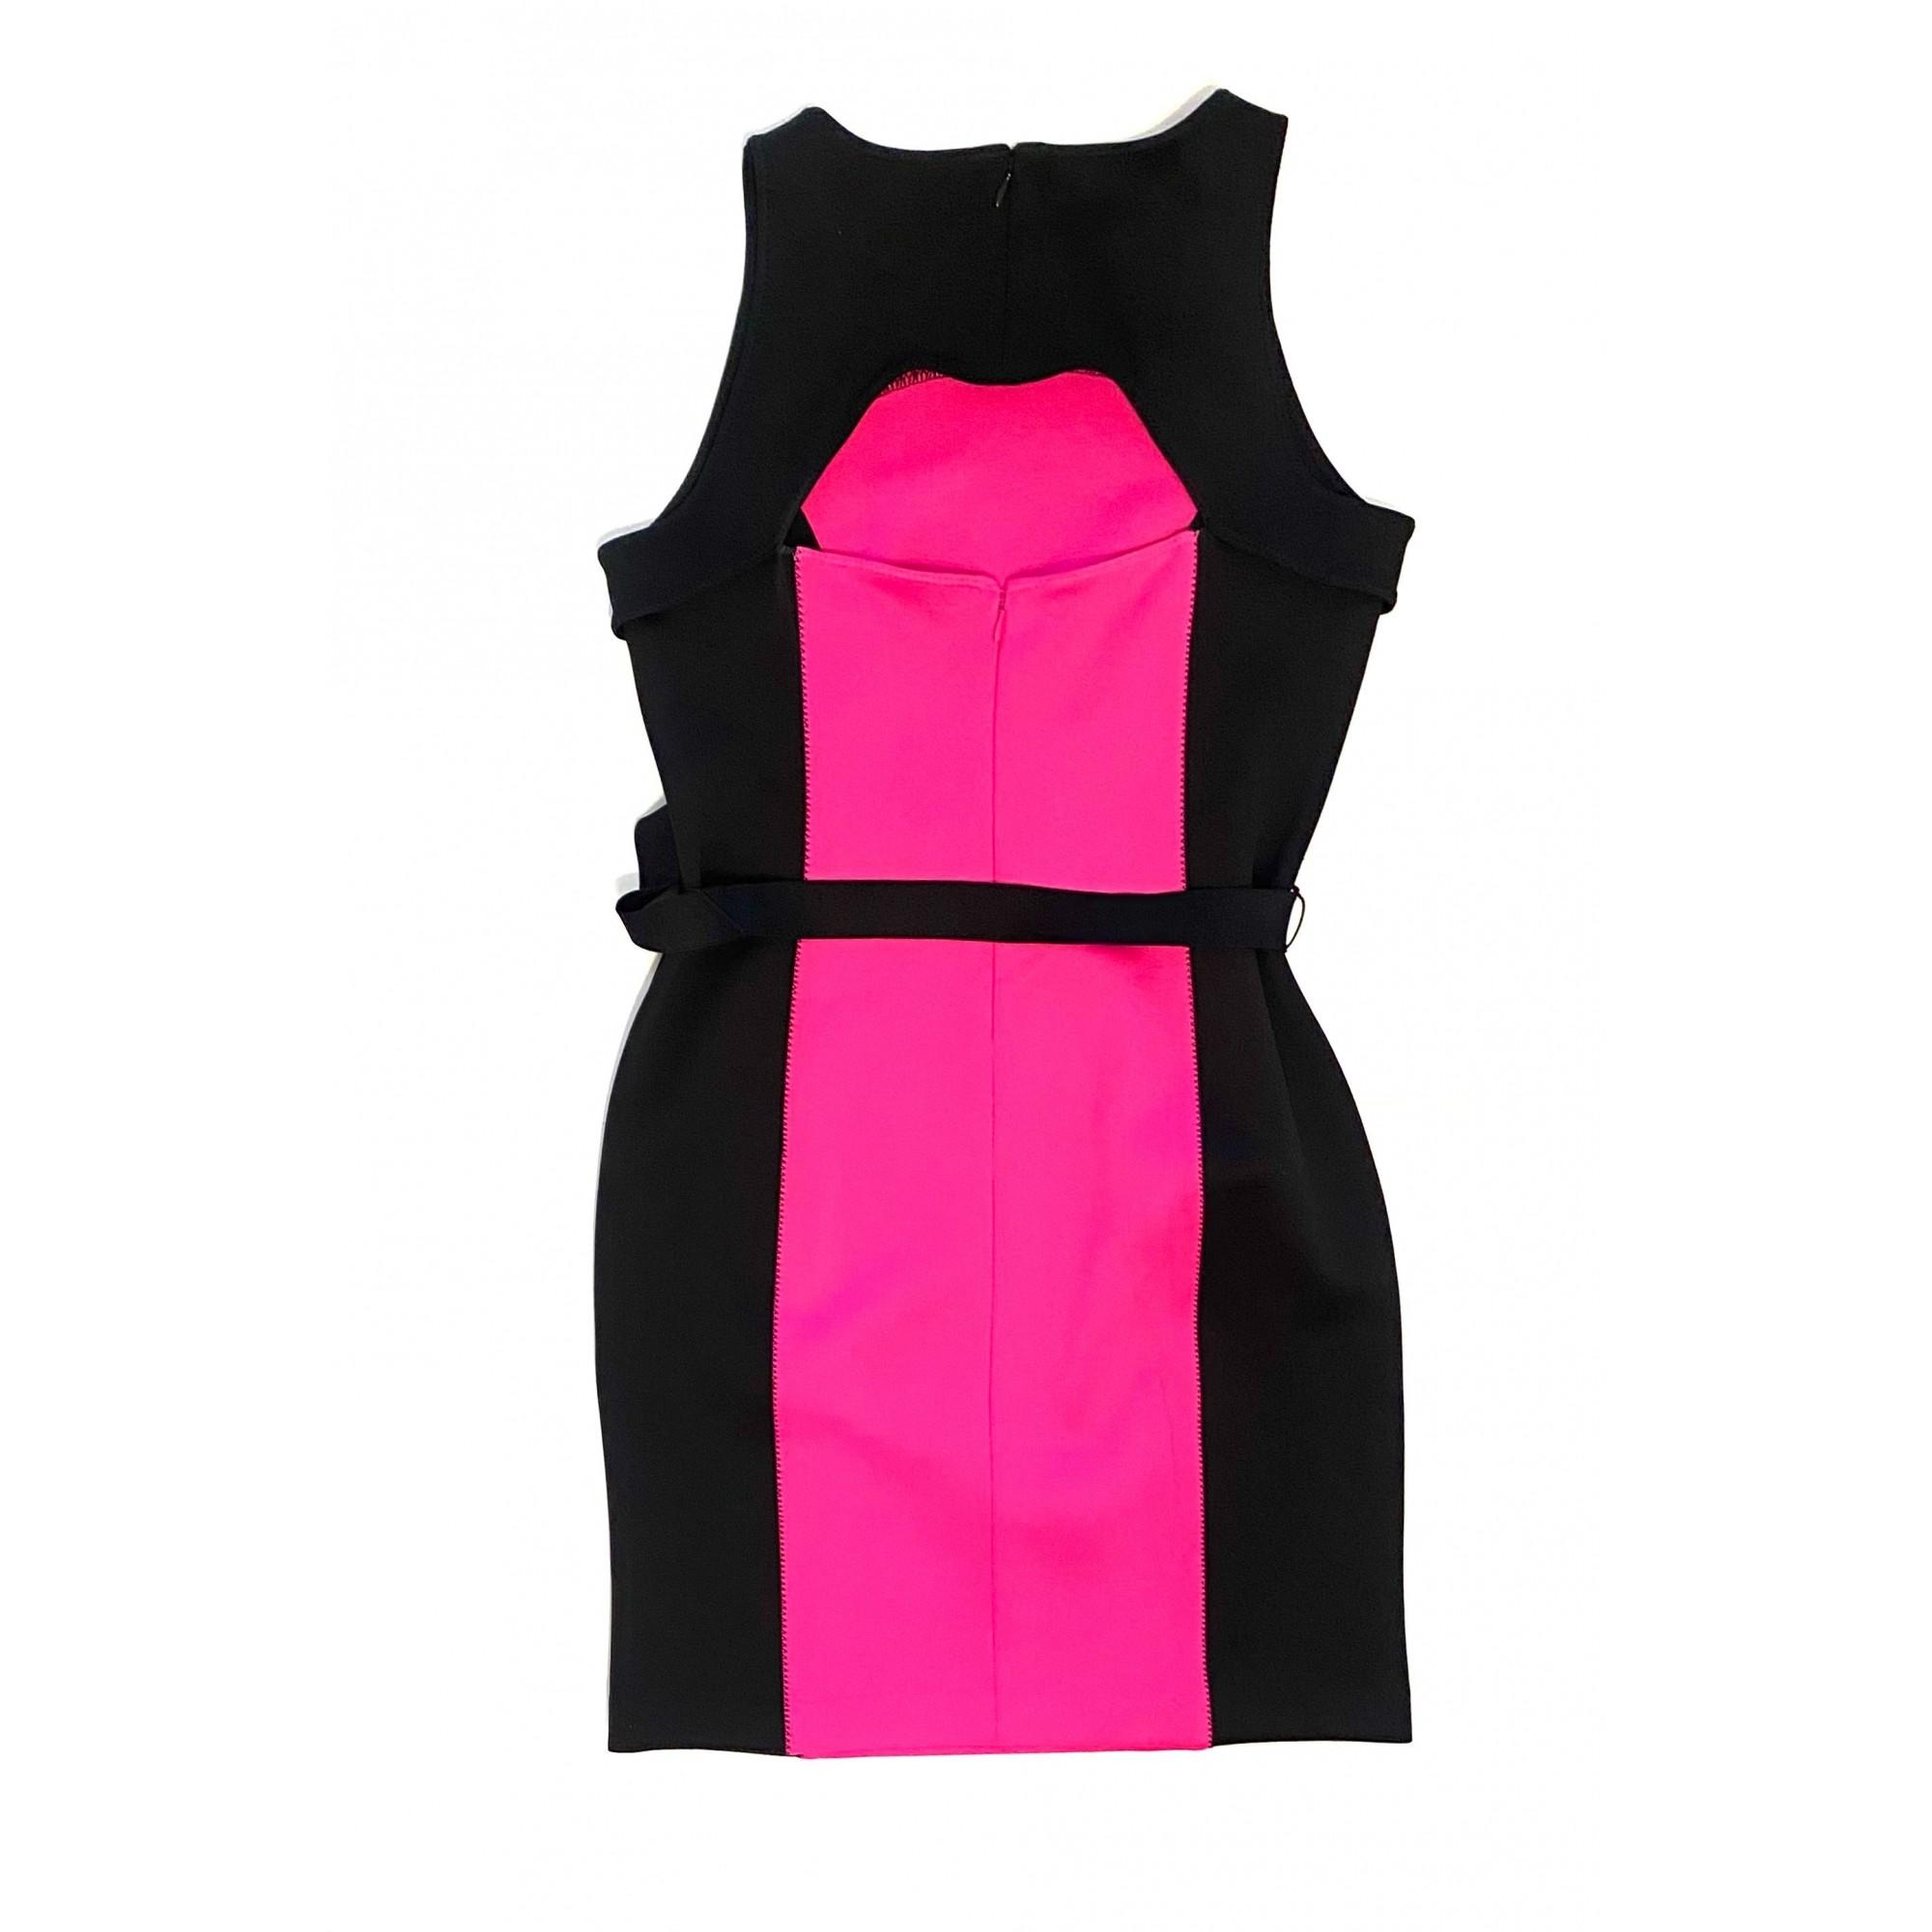 Vestido Michael Kors Preto e Pink